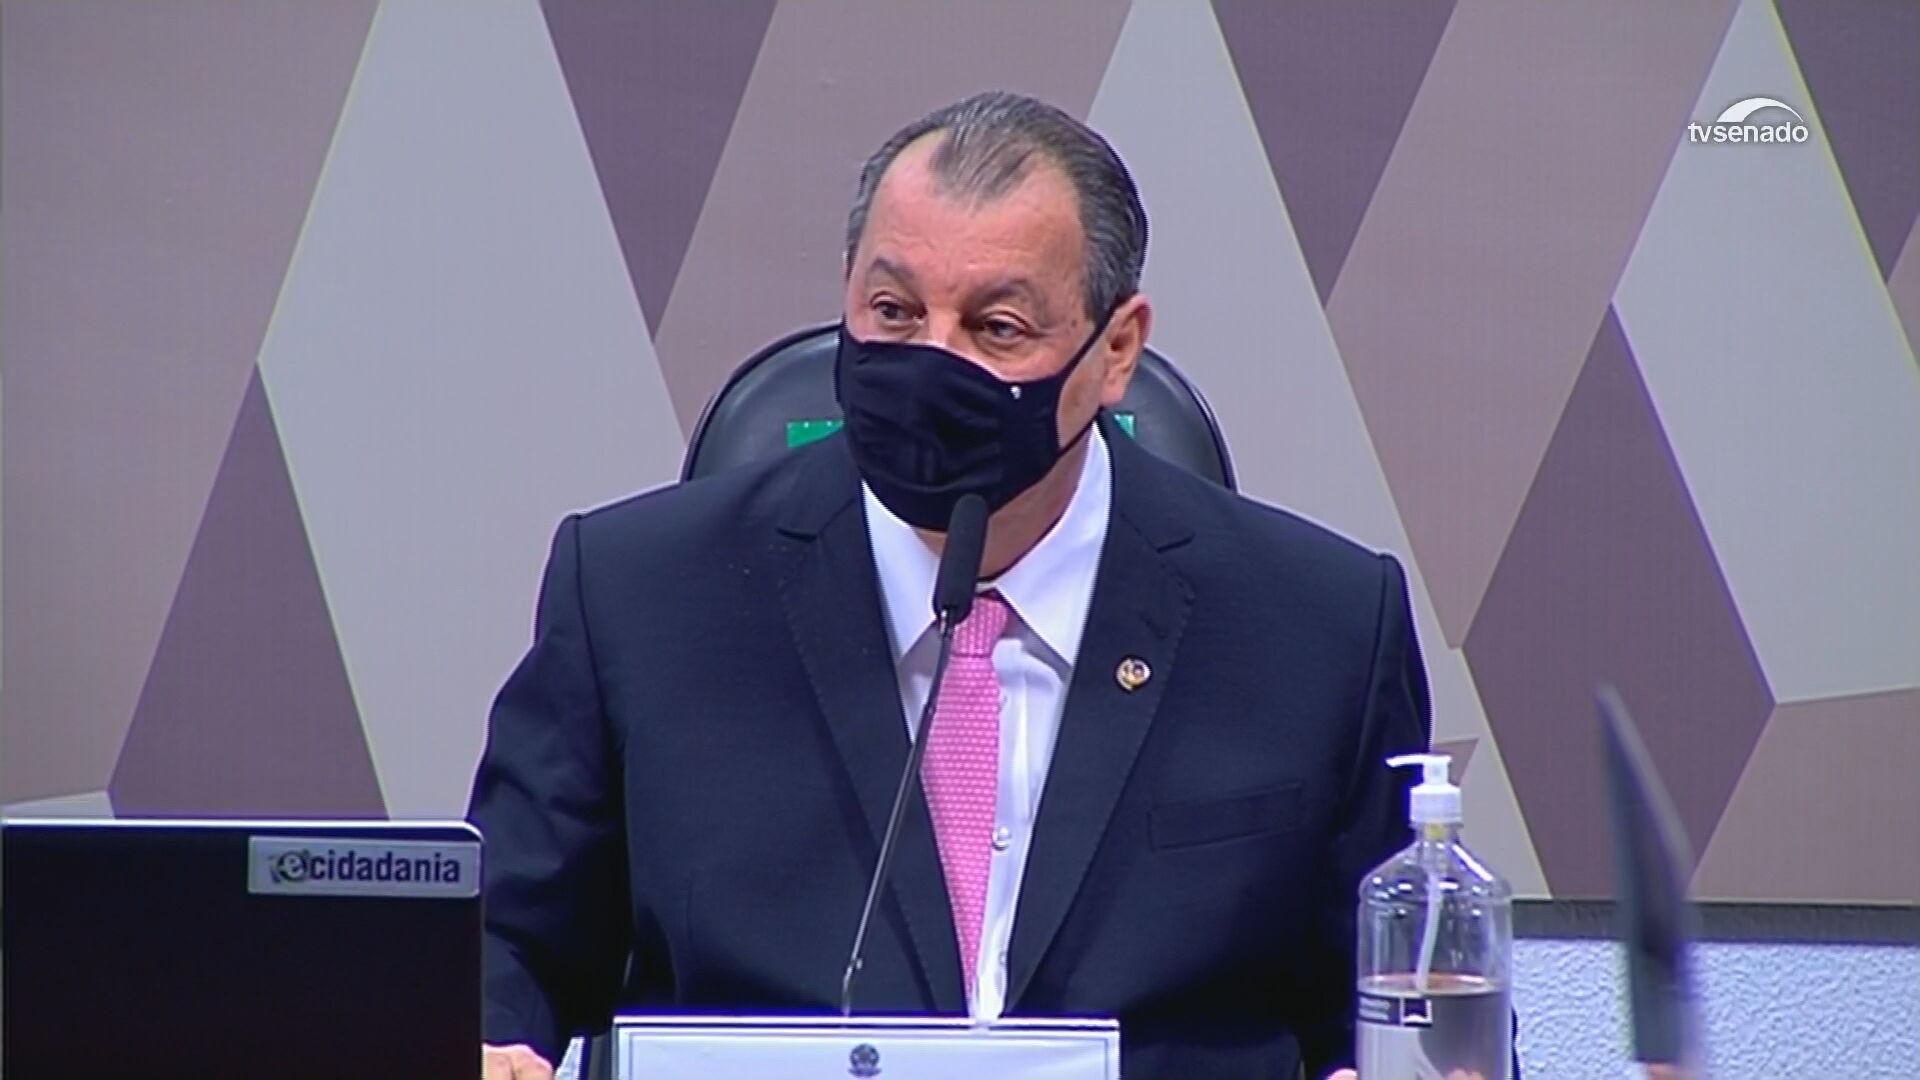 presidente da CPI da Pandemia, Omar Aziz (PSD-AM),